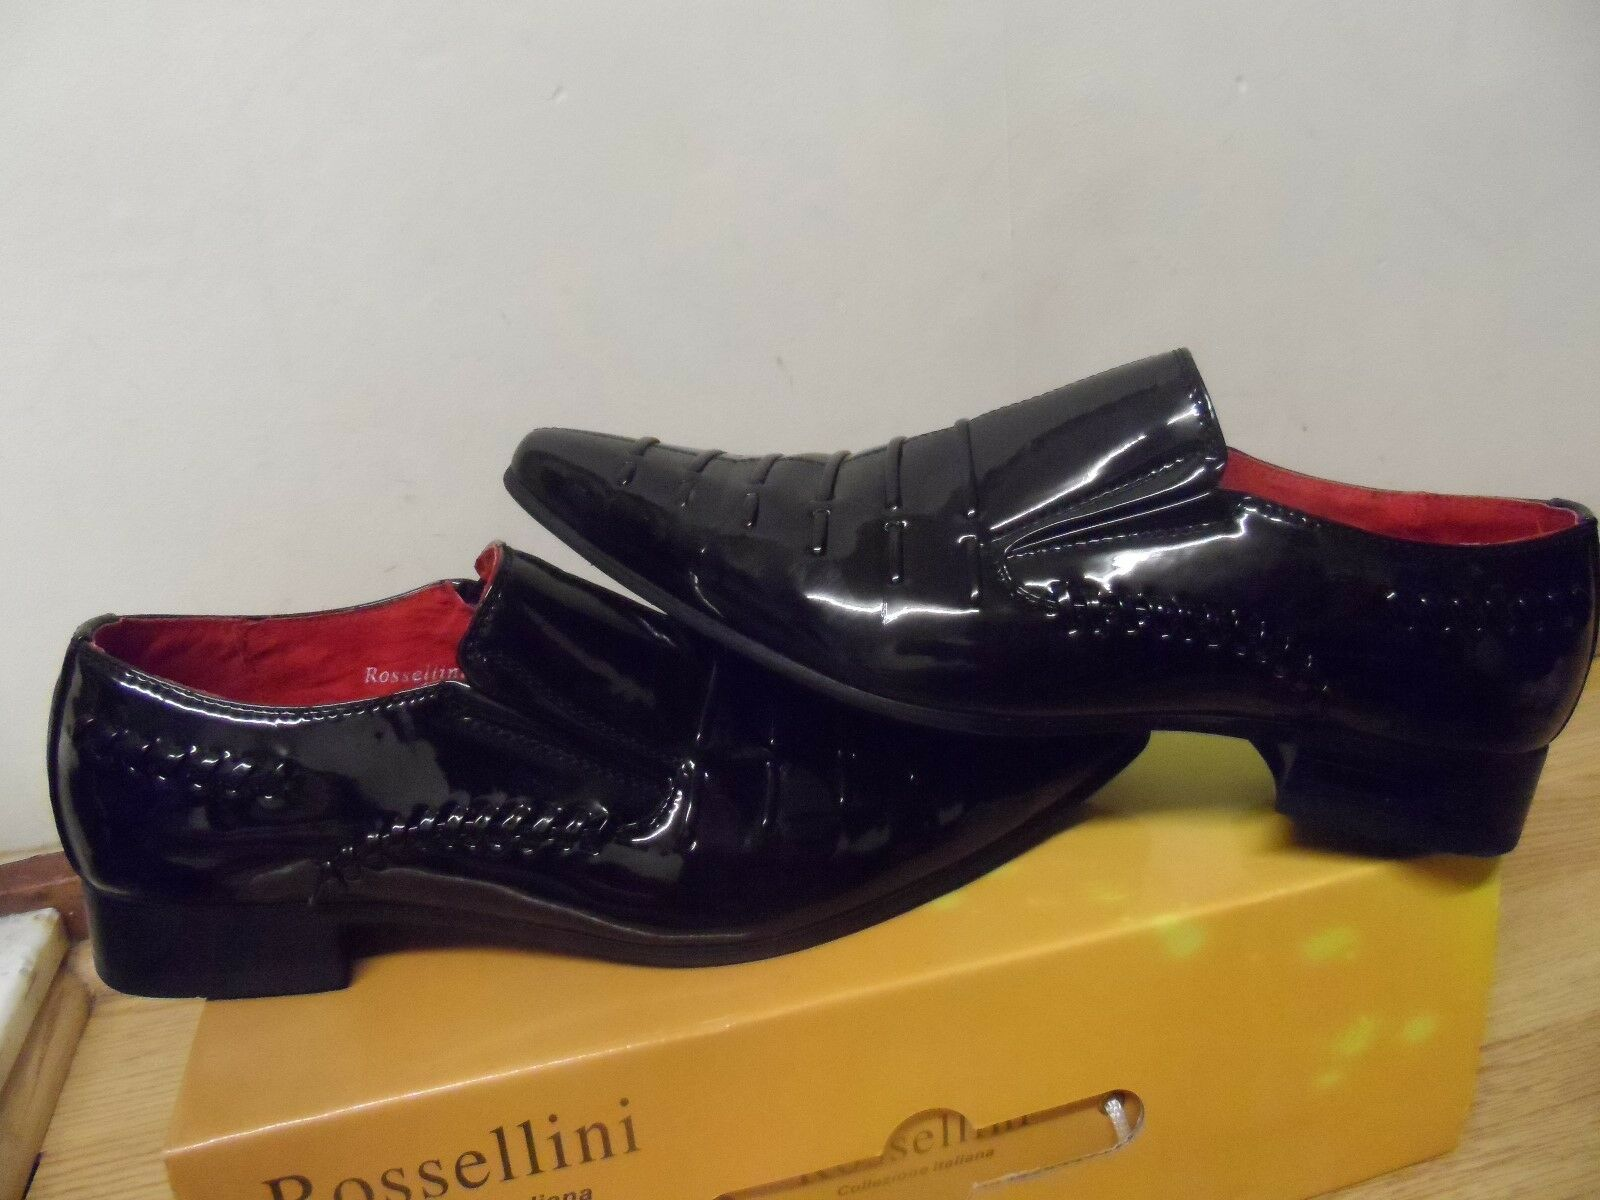 Rossellini Mens Italiana Formal Leather Shoes Size UK 6 / EU 39